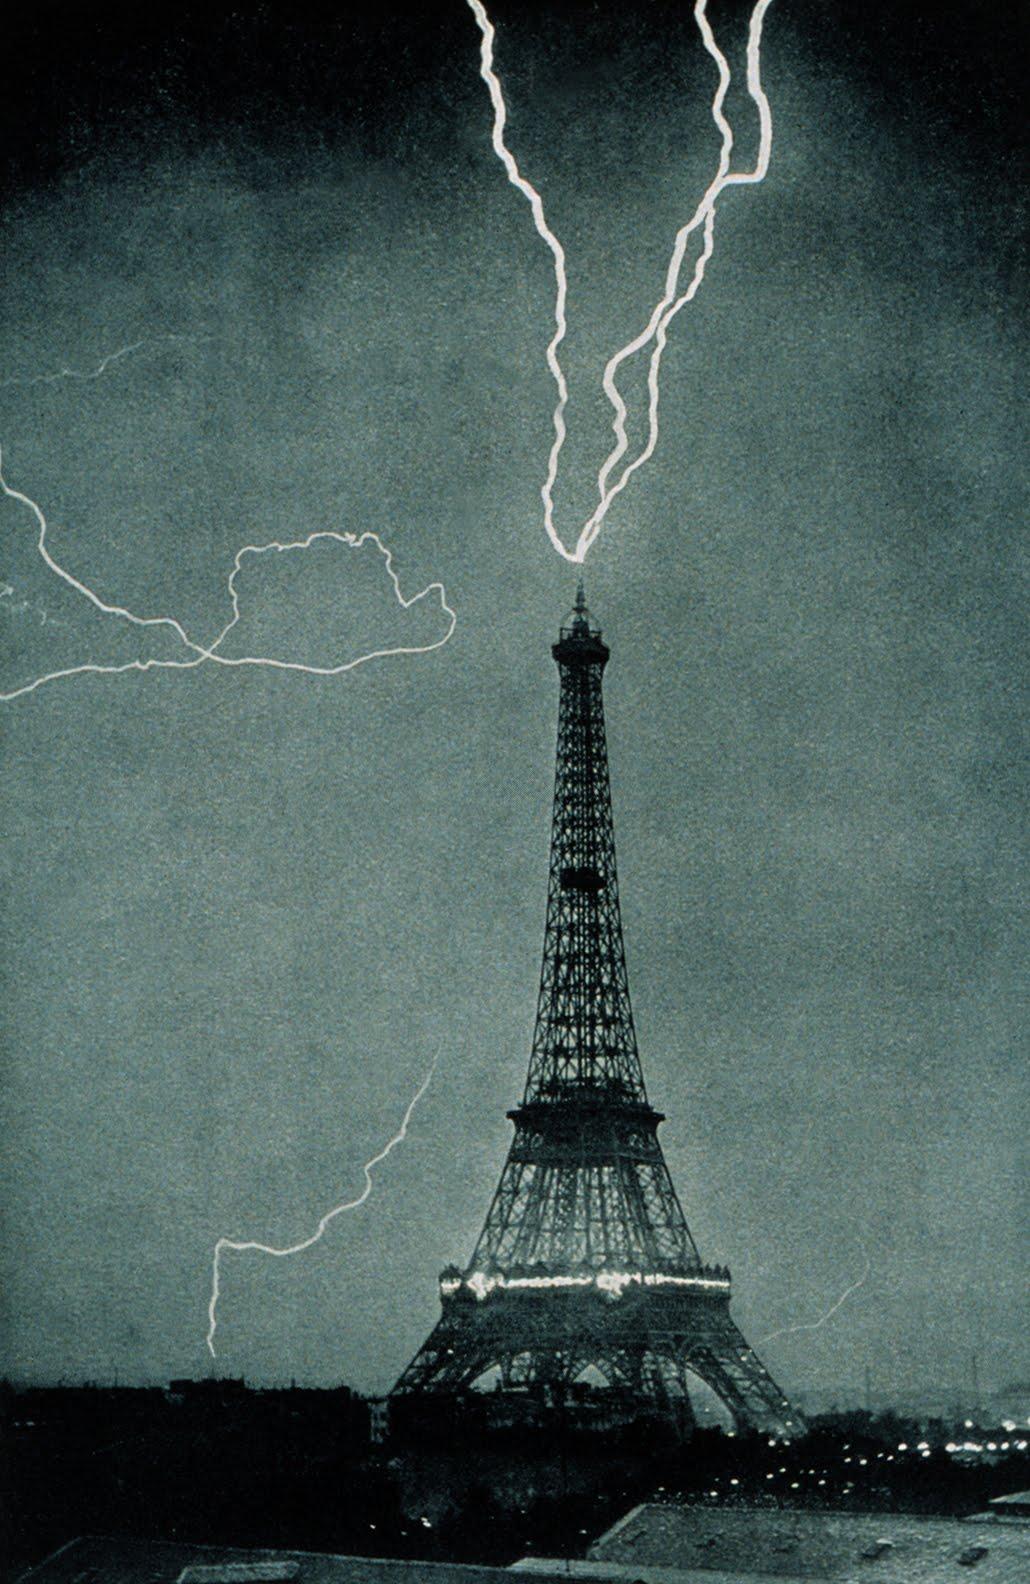 http://4.bp.blogspot.com/_tJcMNBPWJvI/TAyWFh4j36I/AAAAAAAAEDQ/gr-br2KnREs/s1600/Lightning_striking_the_Eiffel_Tower_-_NOAA_edit.jpg